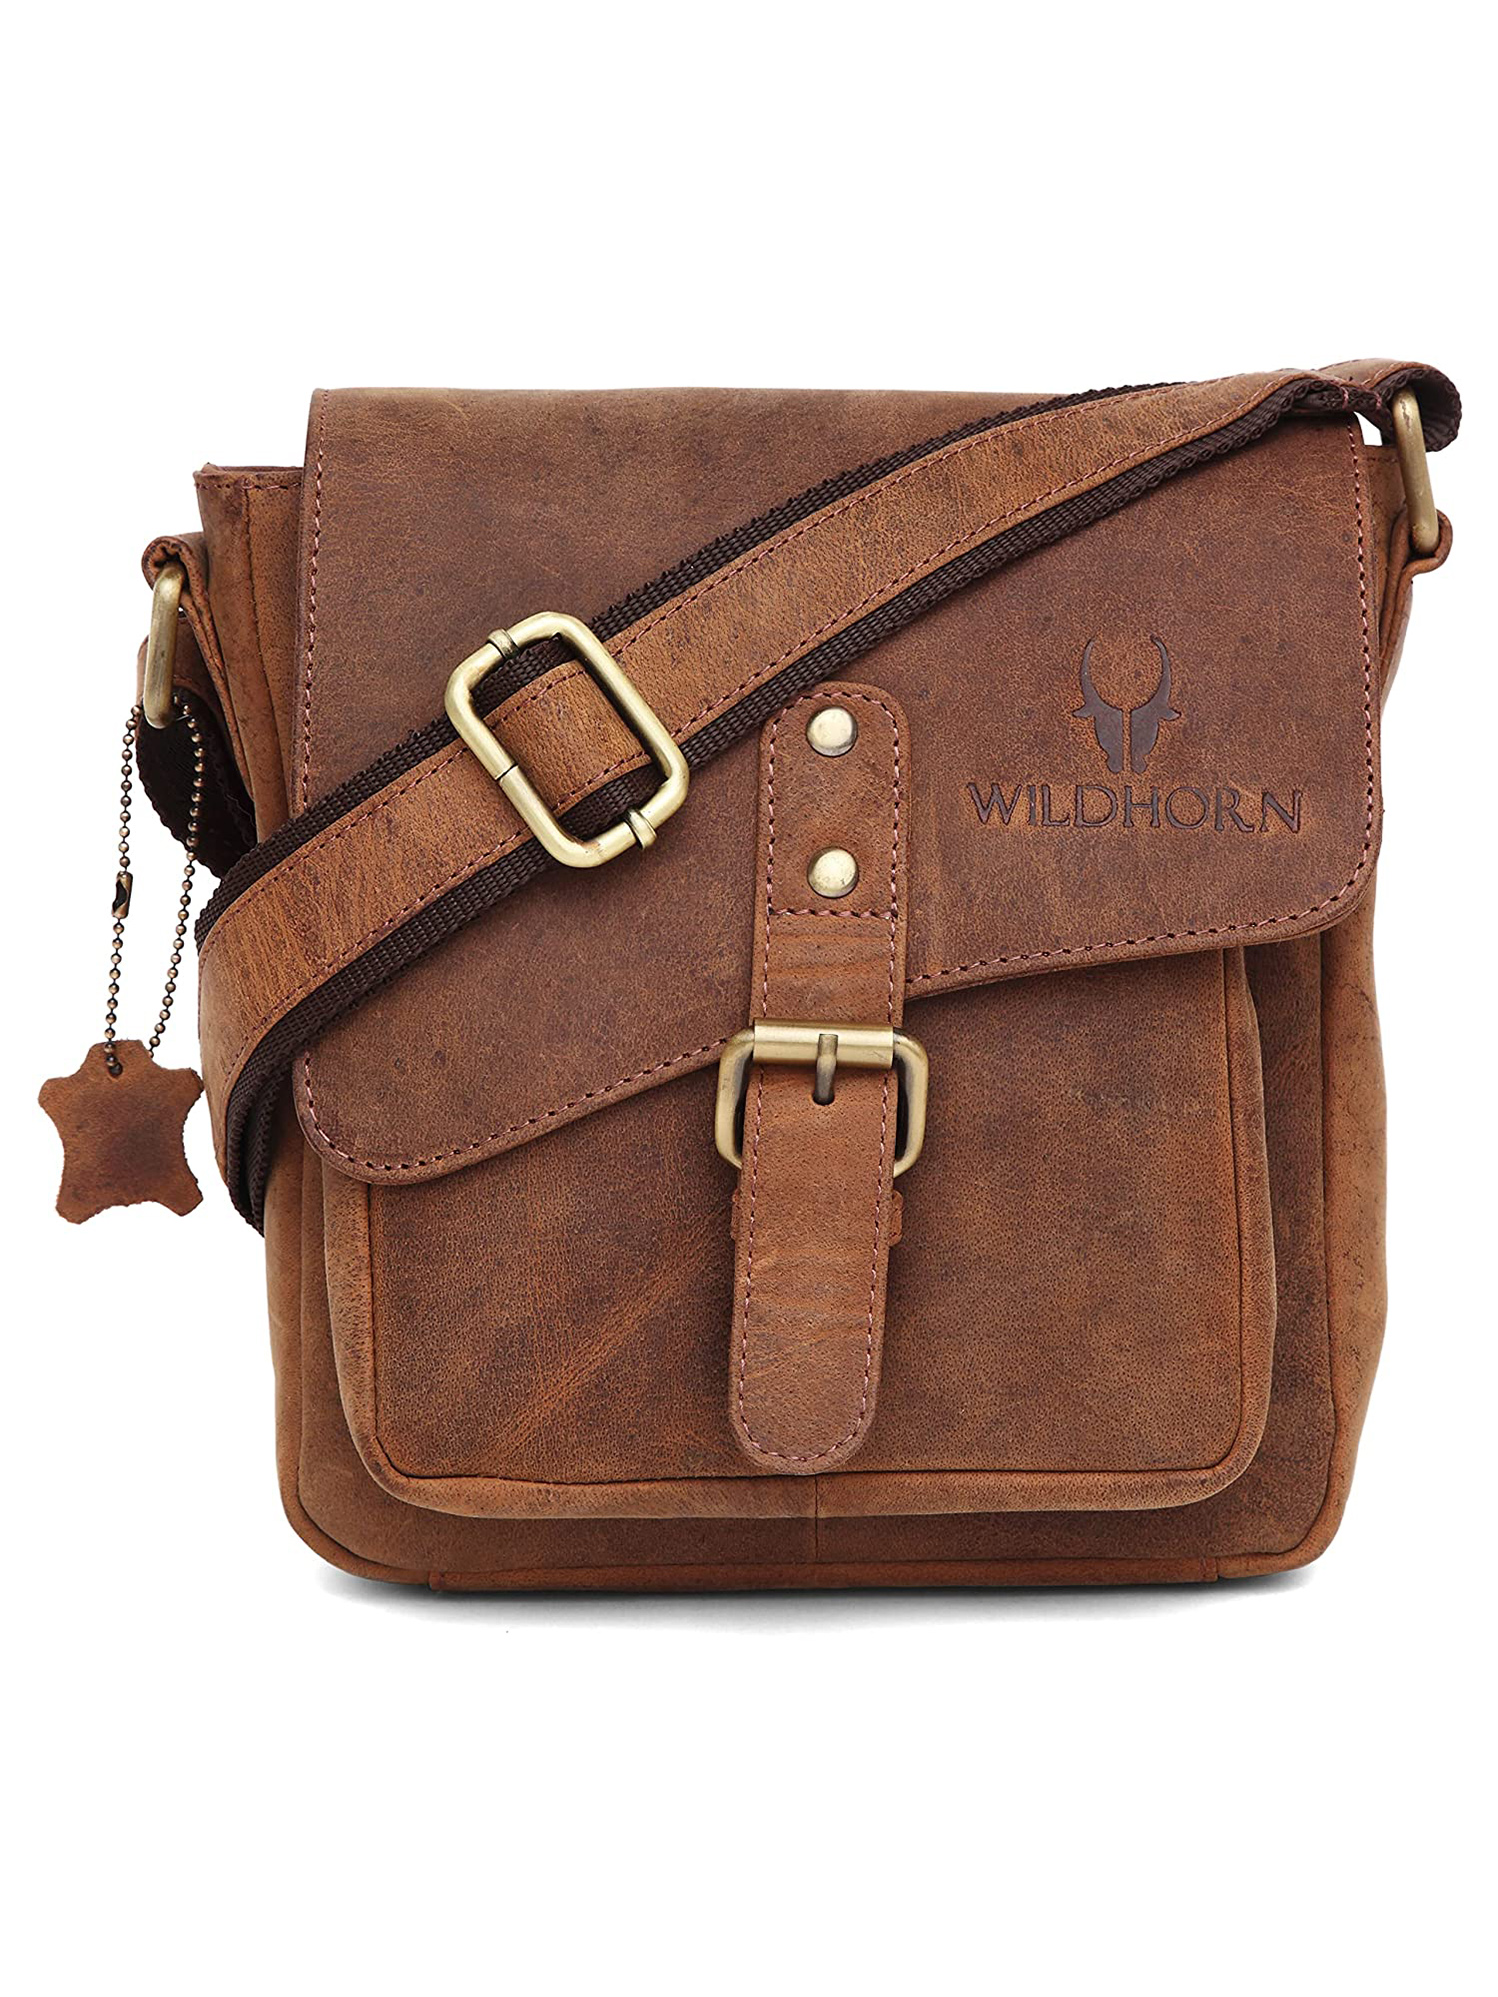 WildHorn   WildHorn 100% Genuine Classic Leather Tan Sling Bag for Men